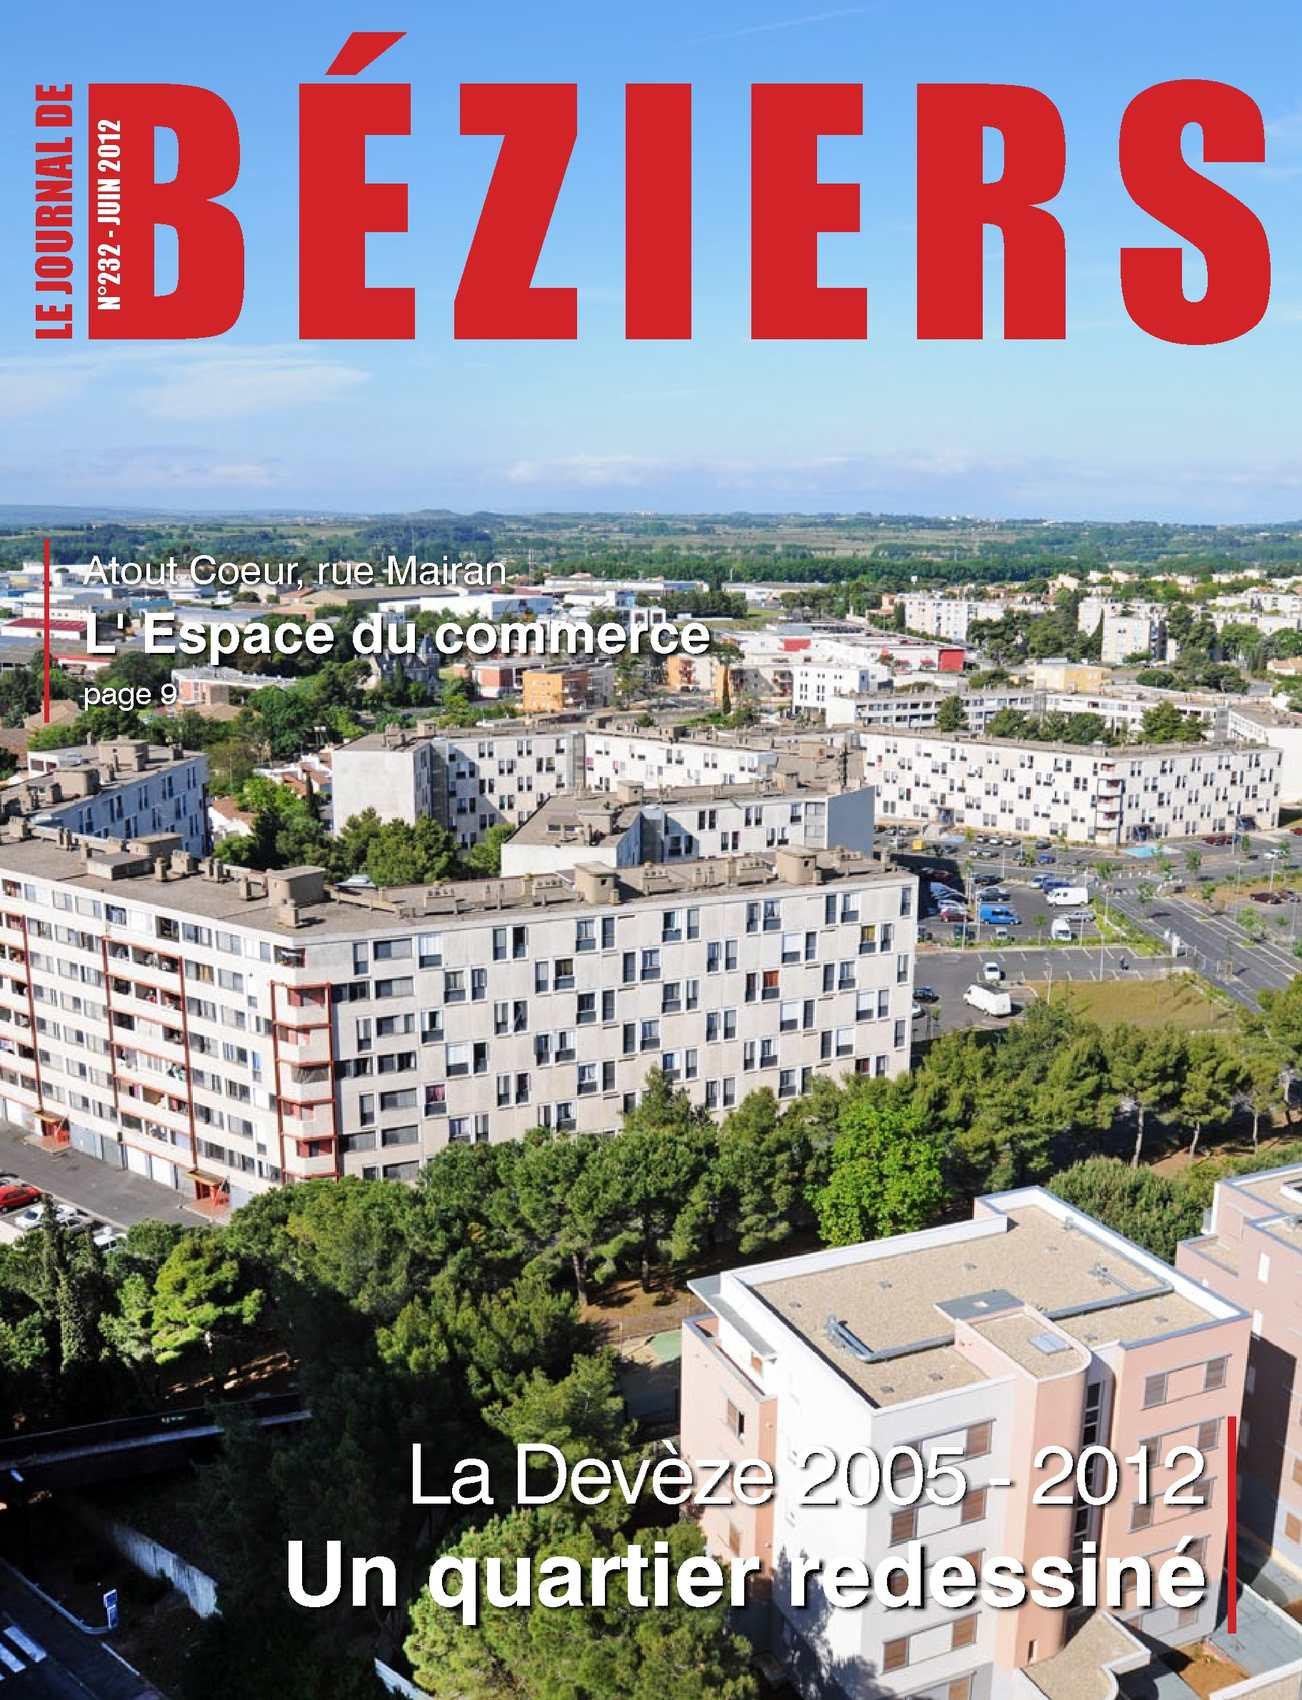 Calaméo Journal de Béziers juin 2012